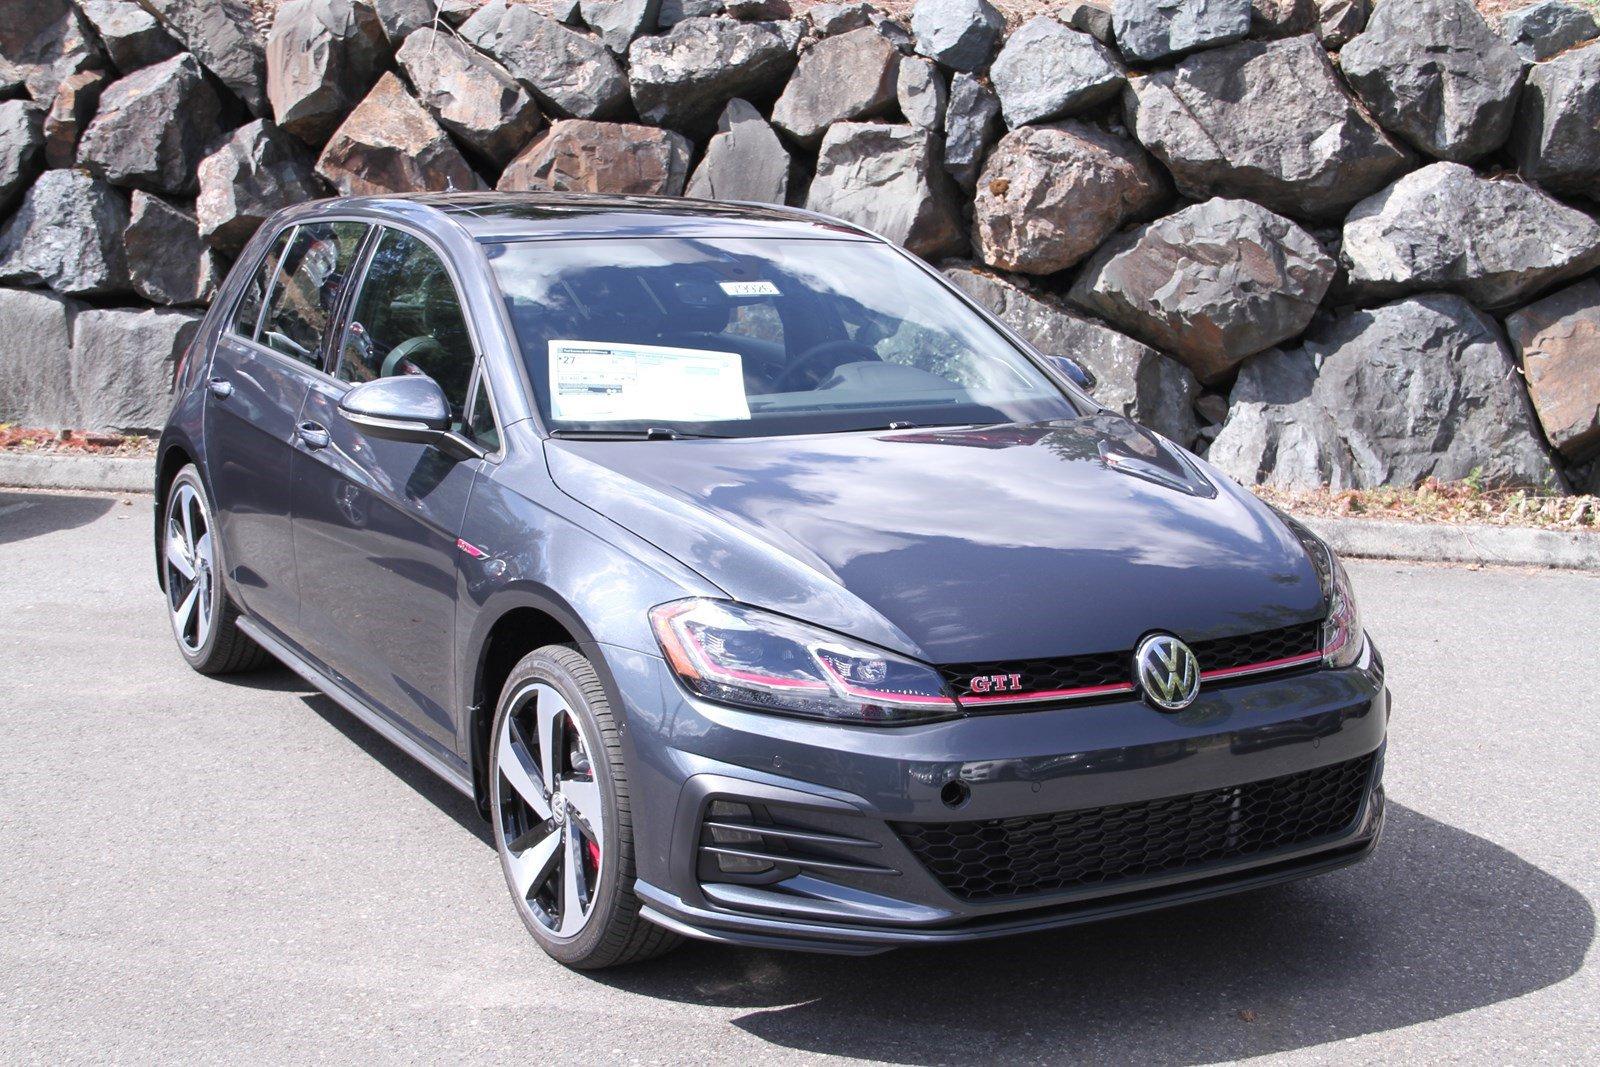 Volkswagen GTI for Sale - Autotrader